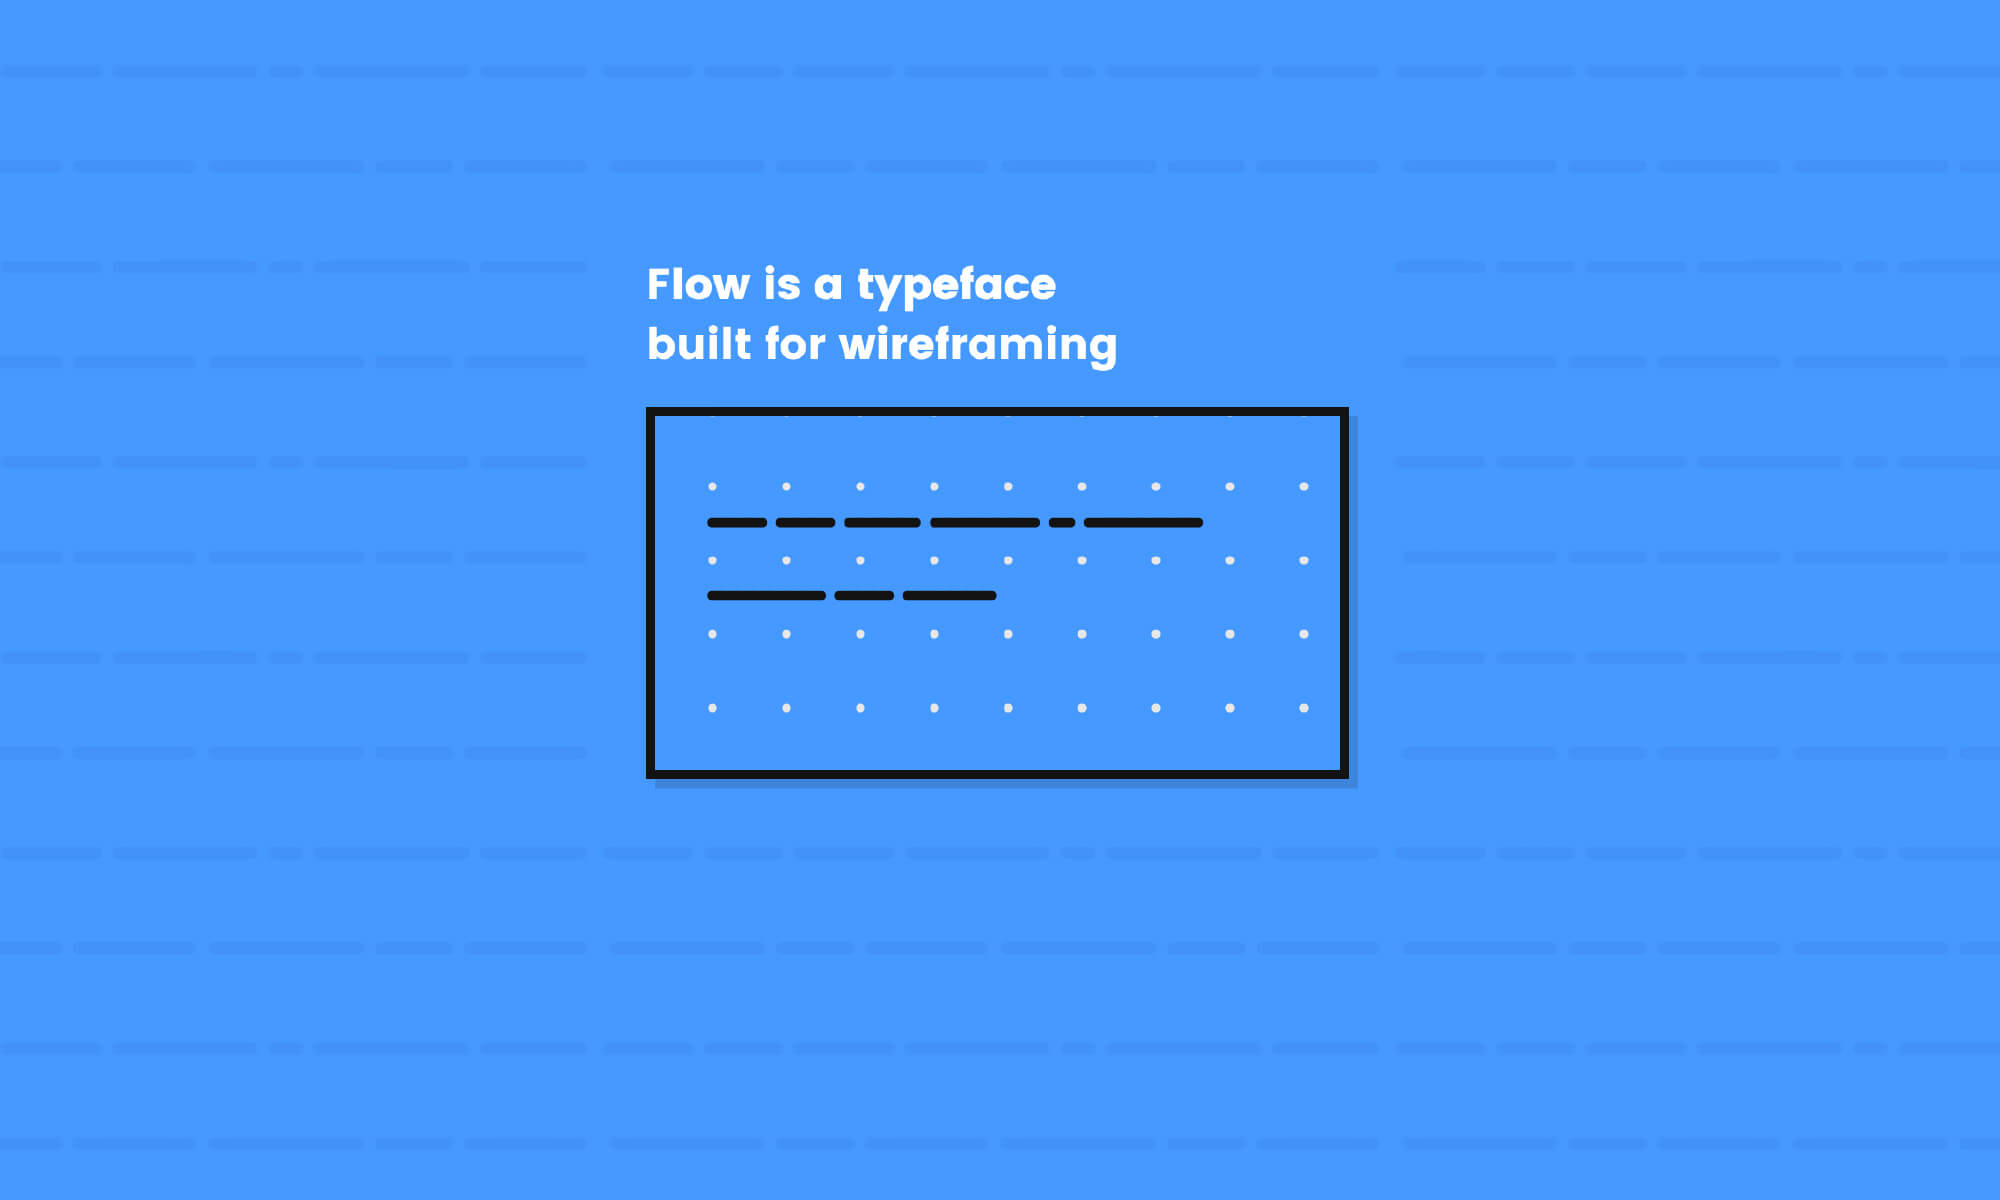 Flow Typeface